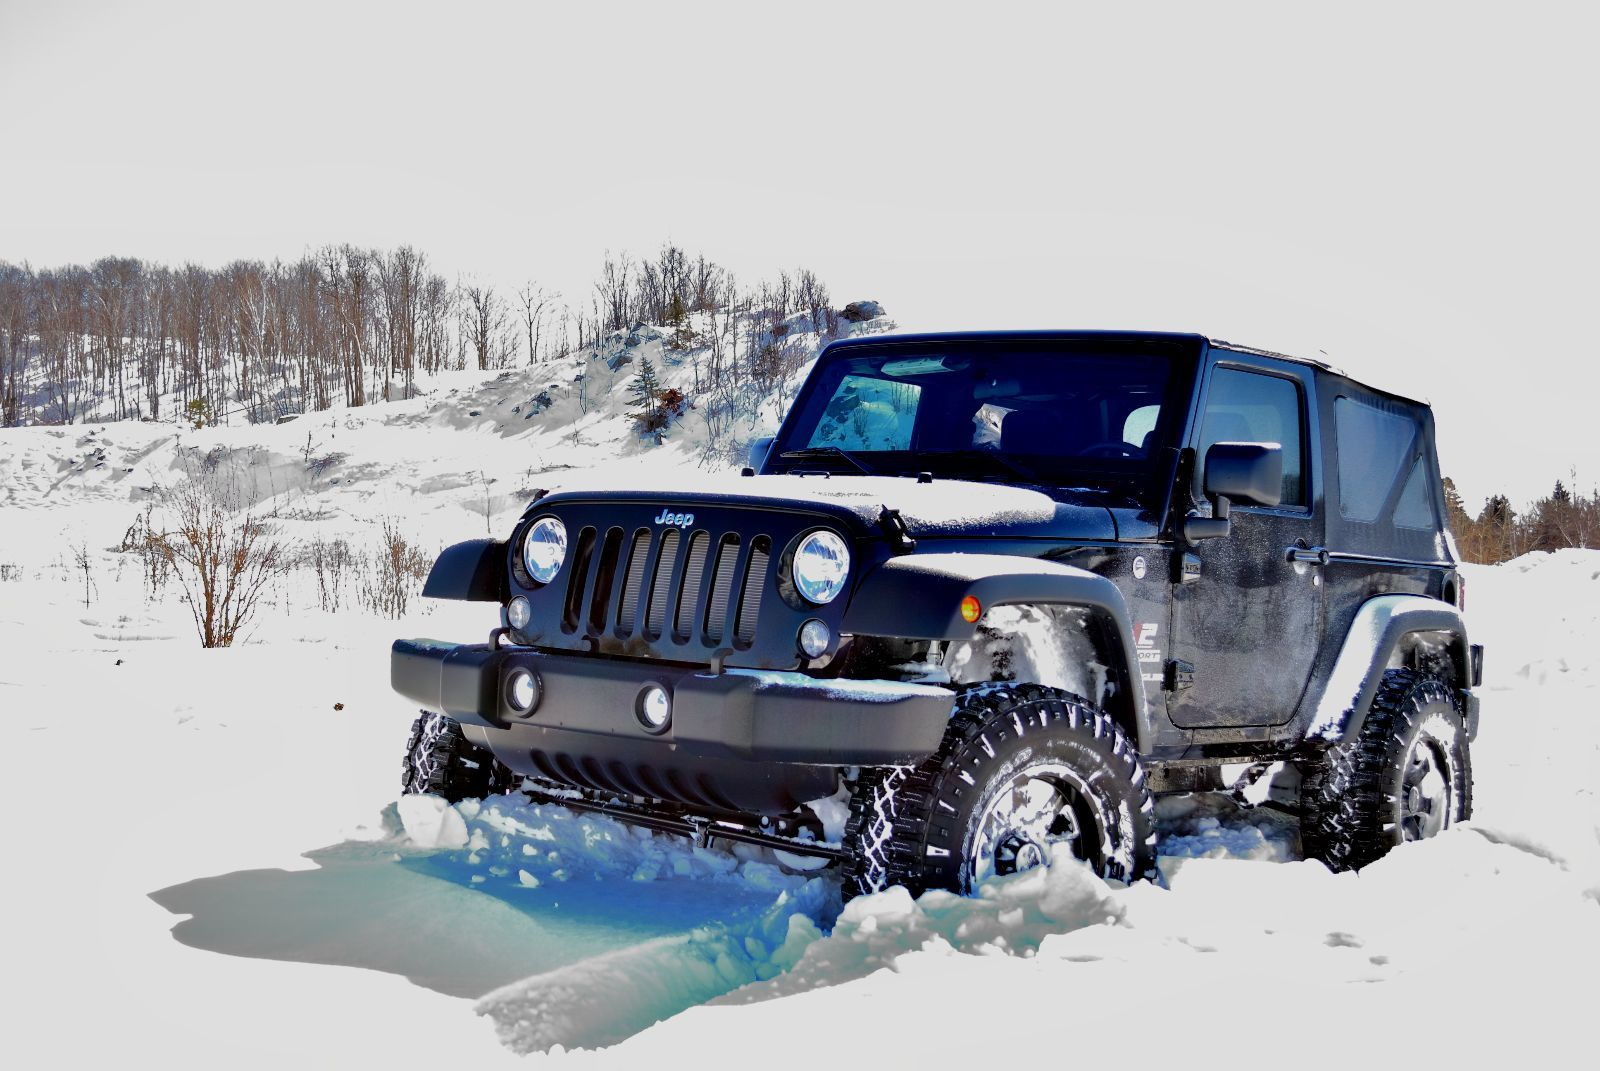 jeep wrangler sport modifi 2016 2016 d 39 occasion l vis inventaire d 39 occasion l vis. Black Bedroom Furniture Sets. Home Design Ideas